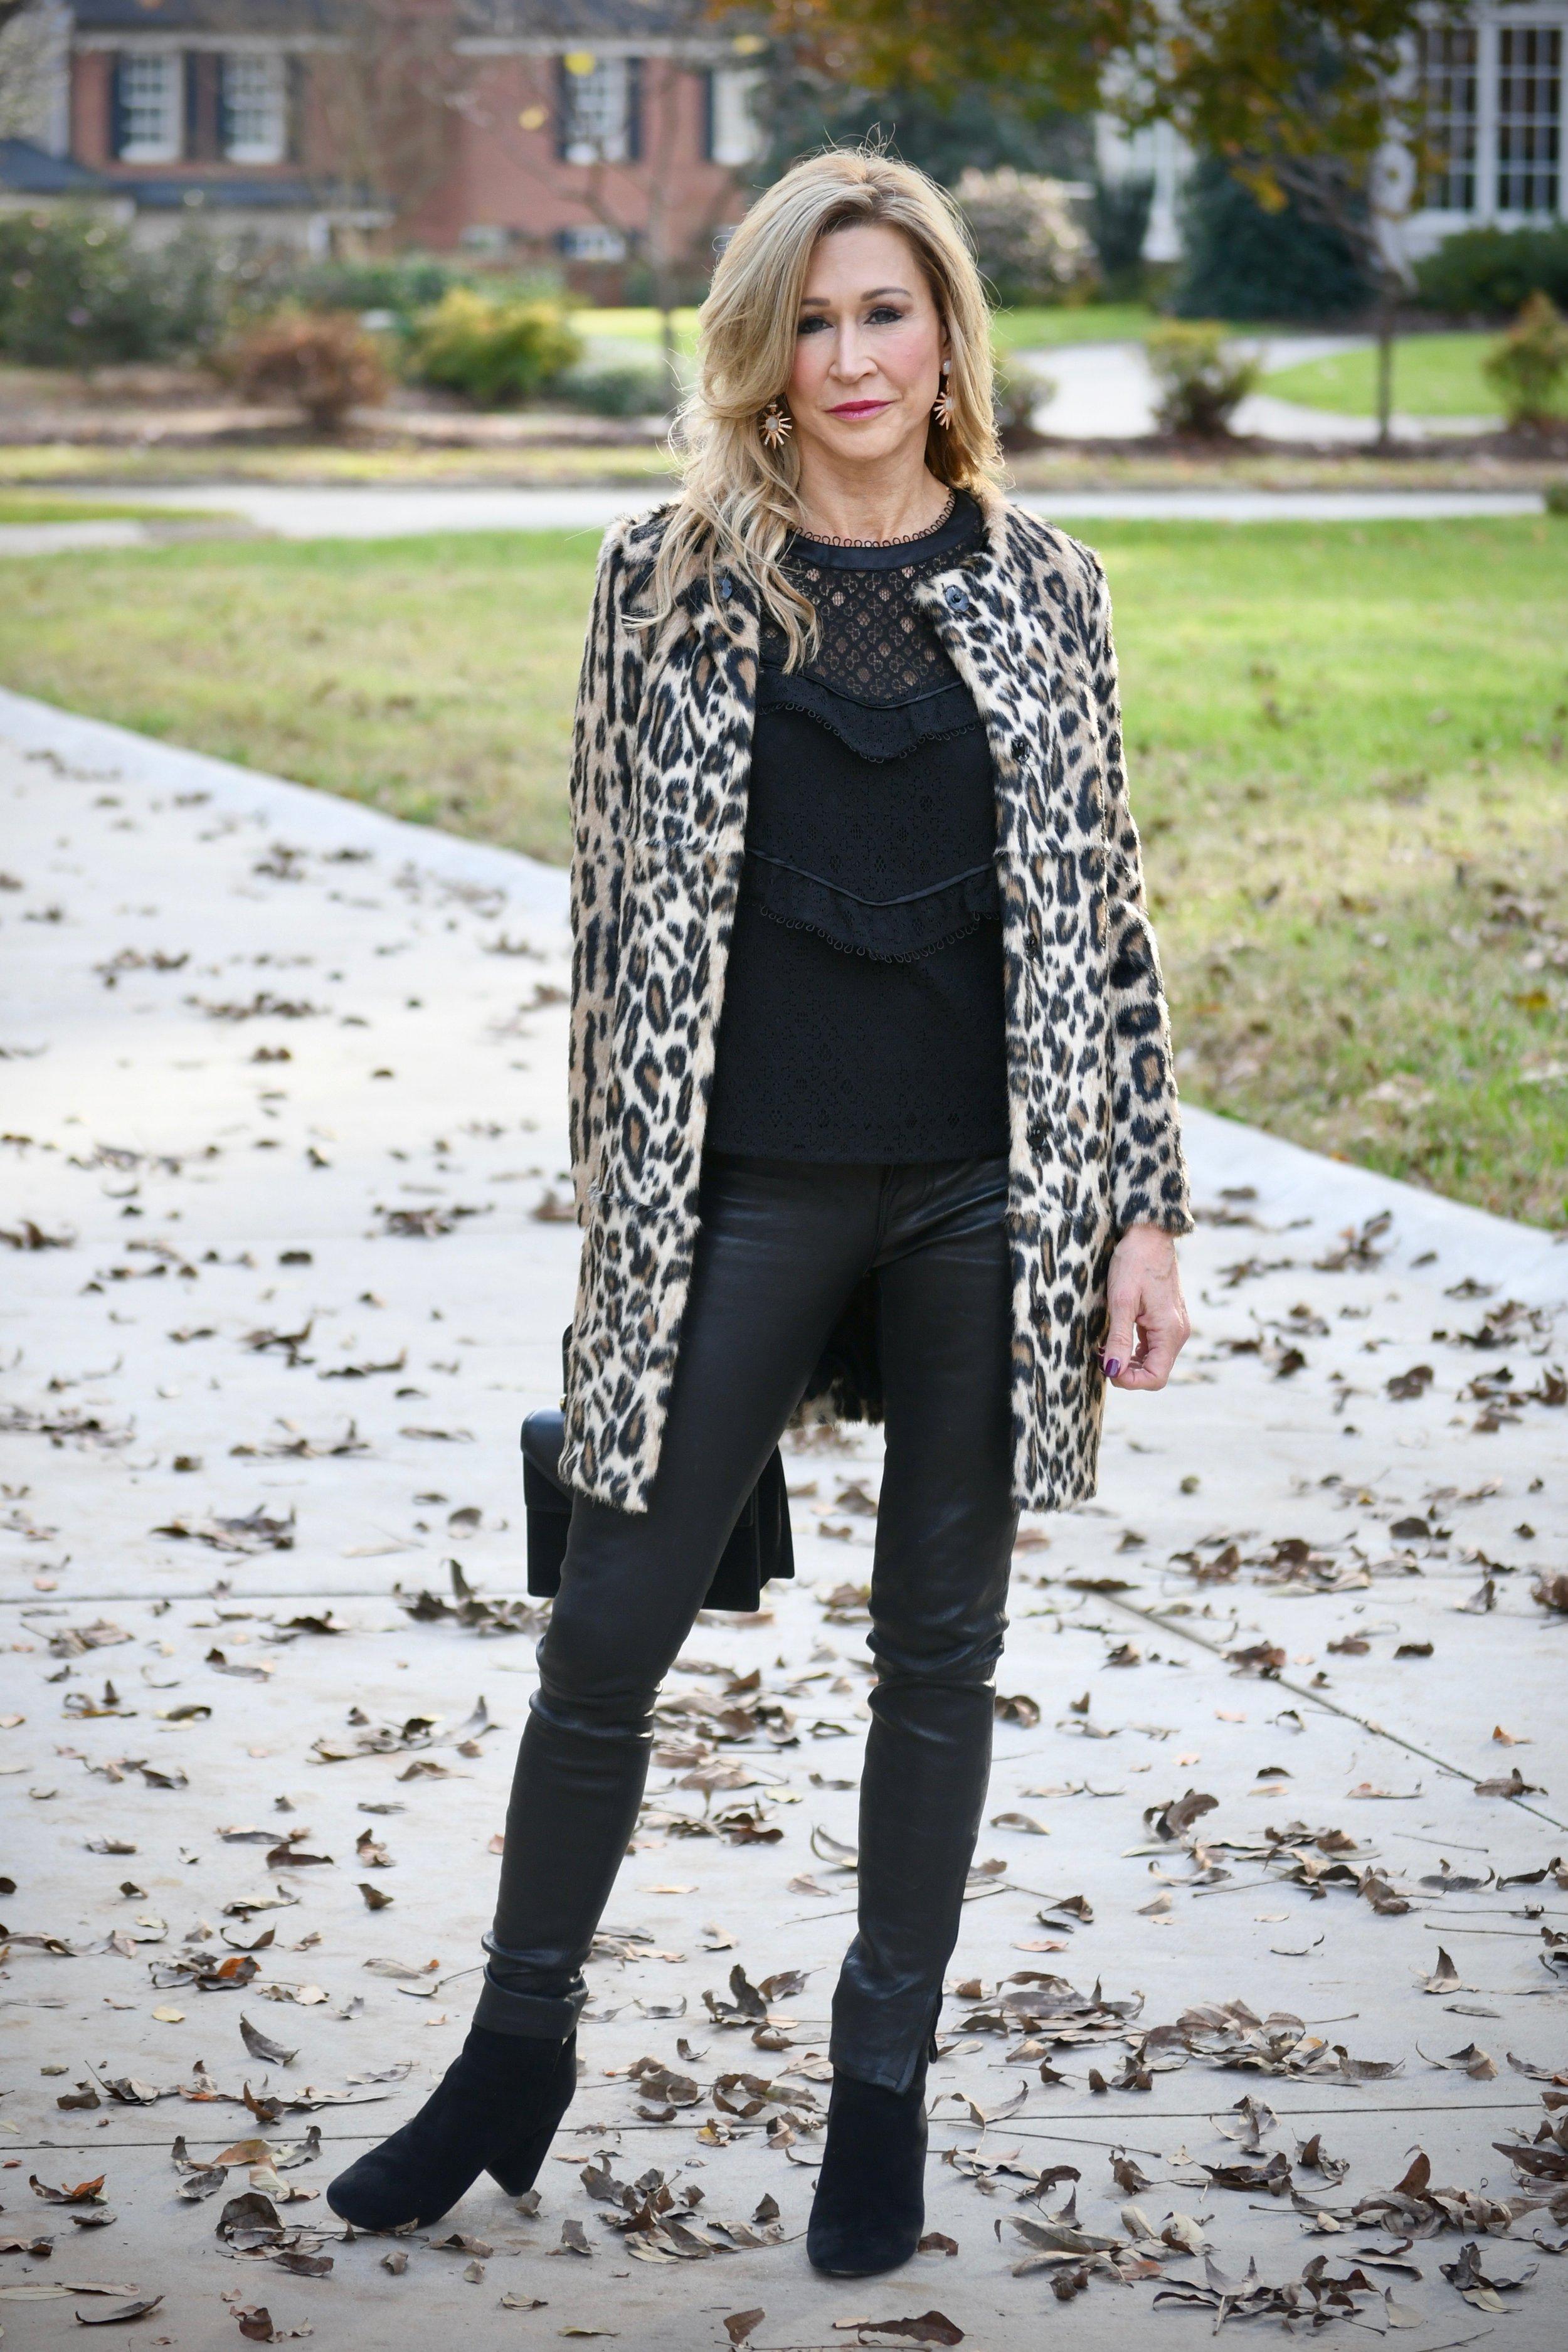 Leopard Coat & Leather Pants - Crazy Blonde Style